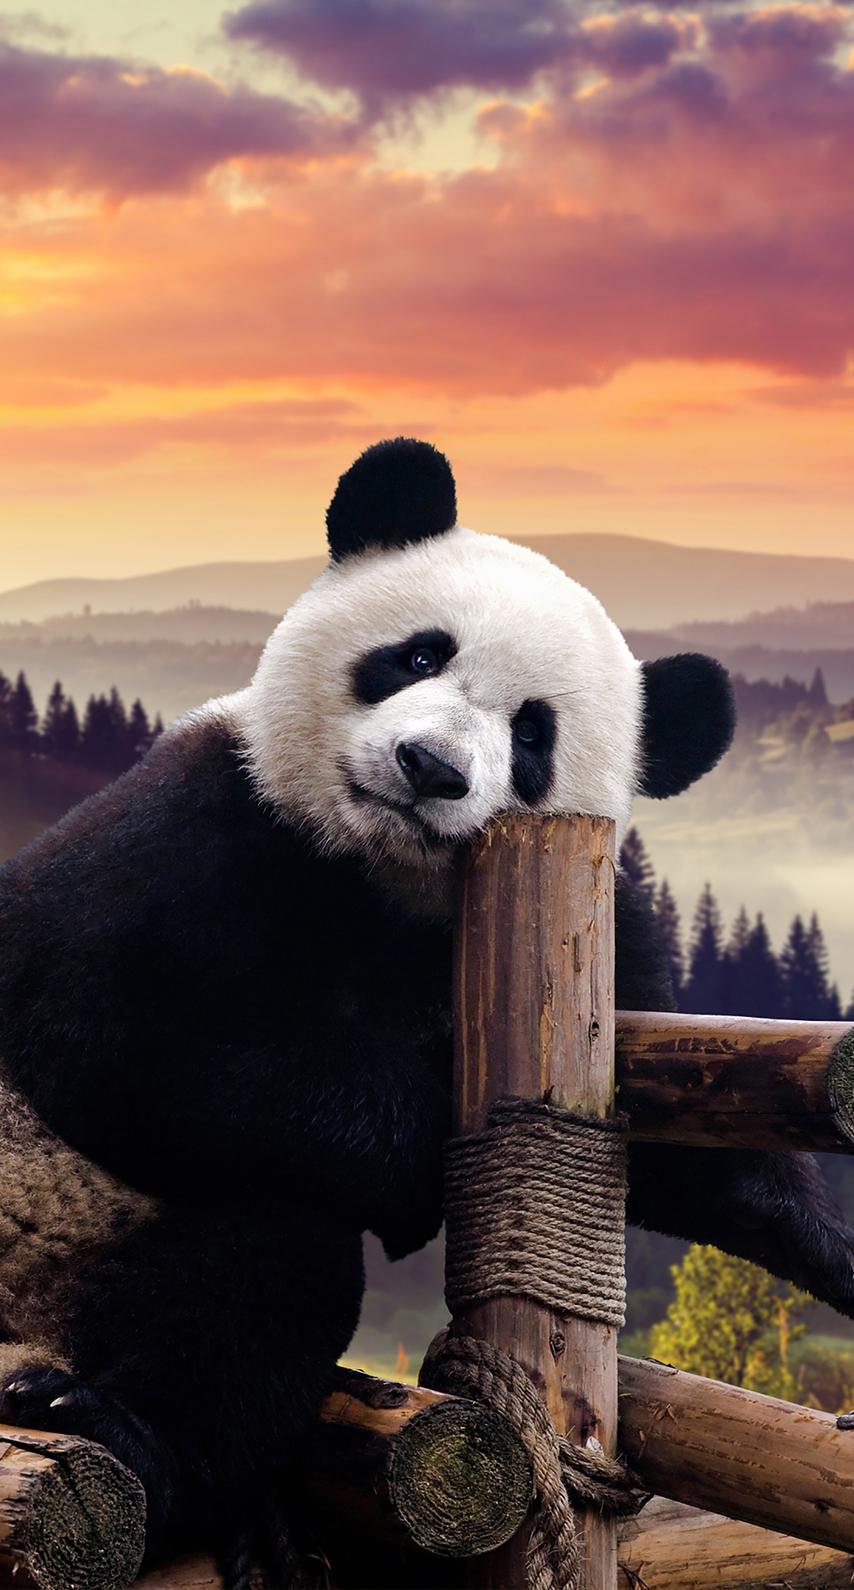 snout, giant panda